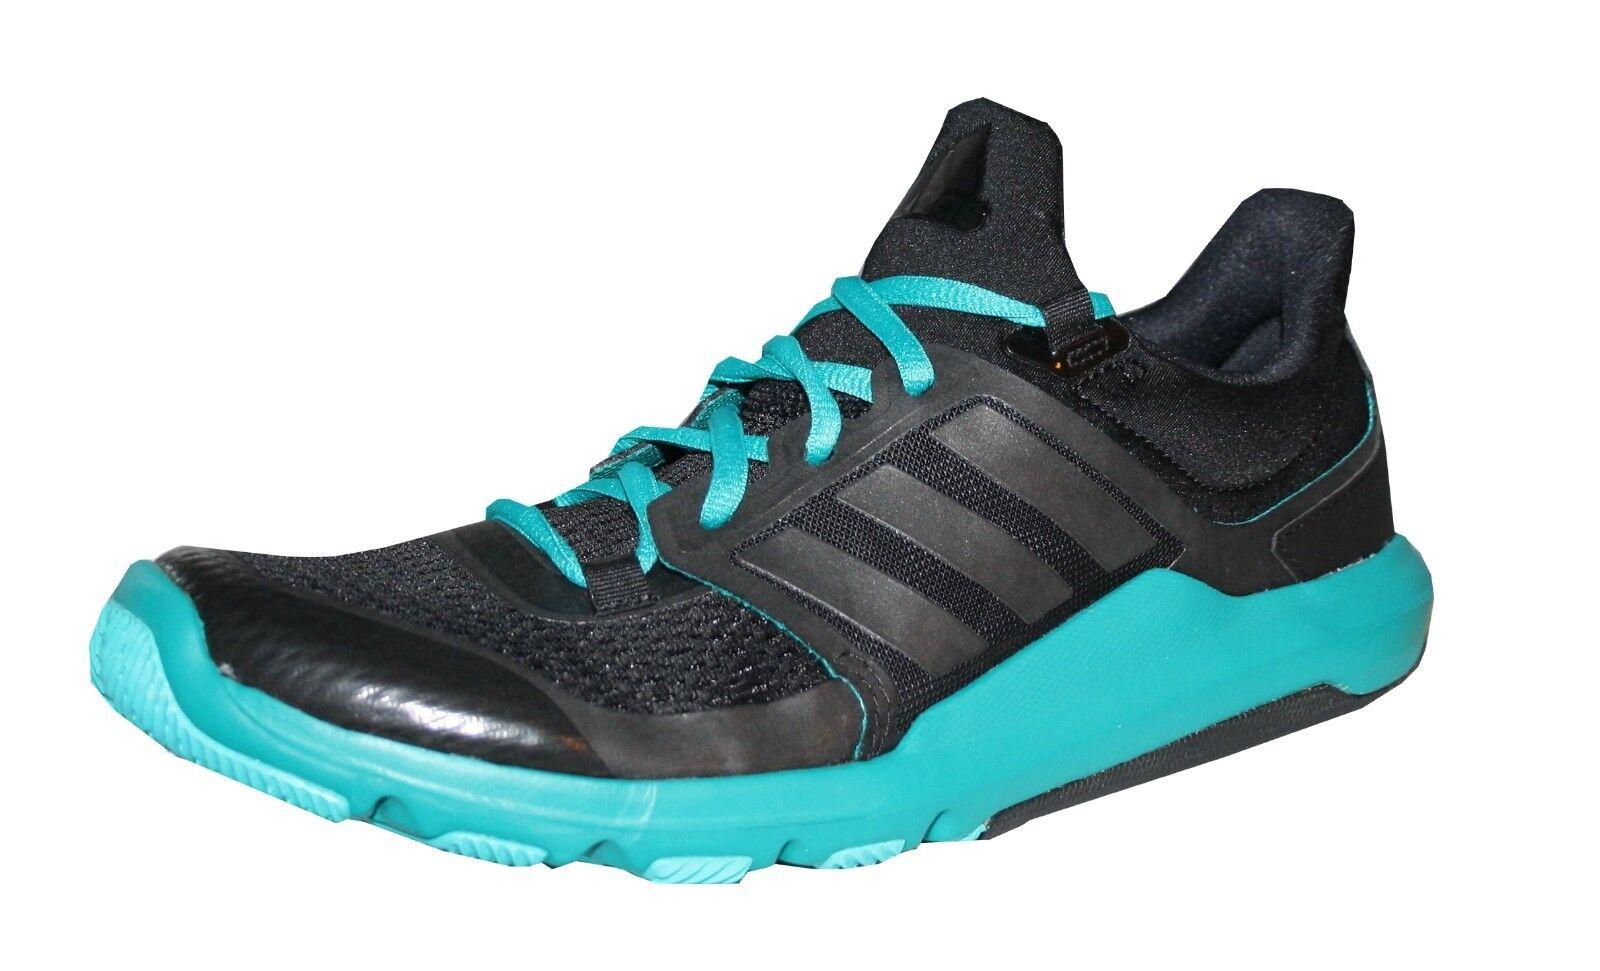 Adidas Adipure 360.3 M Herren Sportschuhe Sneaker Fitness Trainingsschuhe 48 2/3